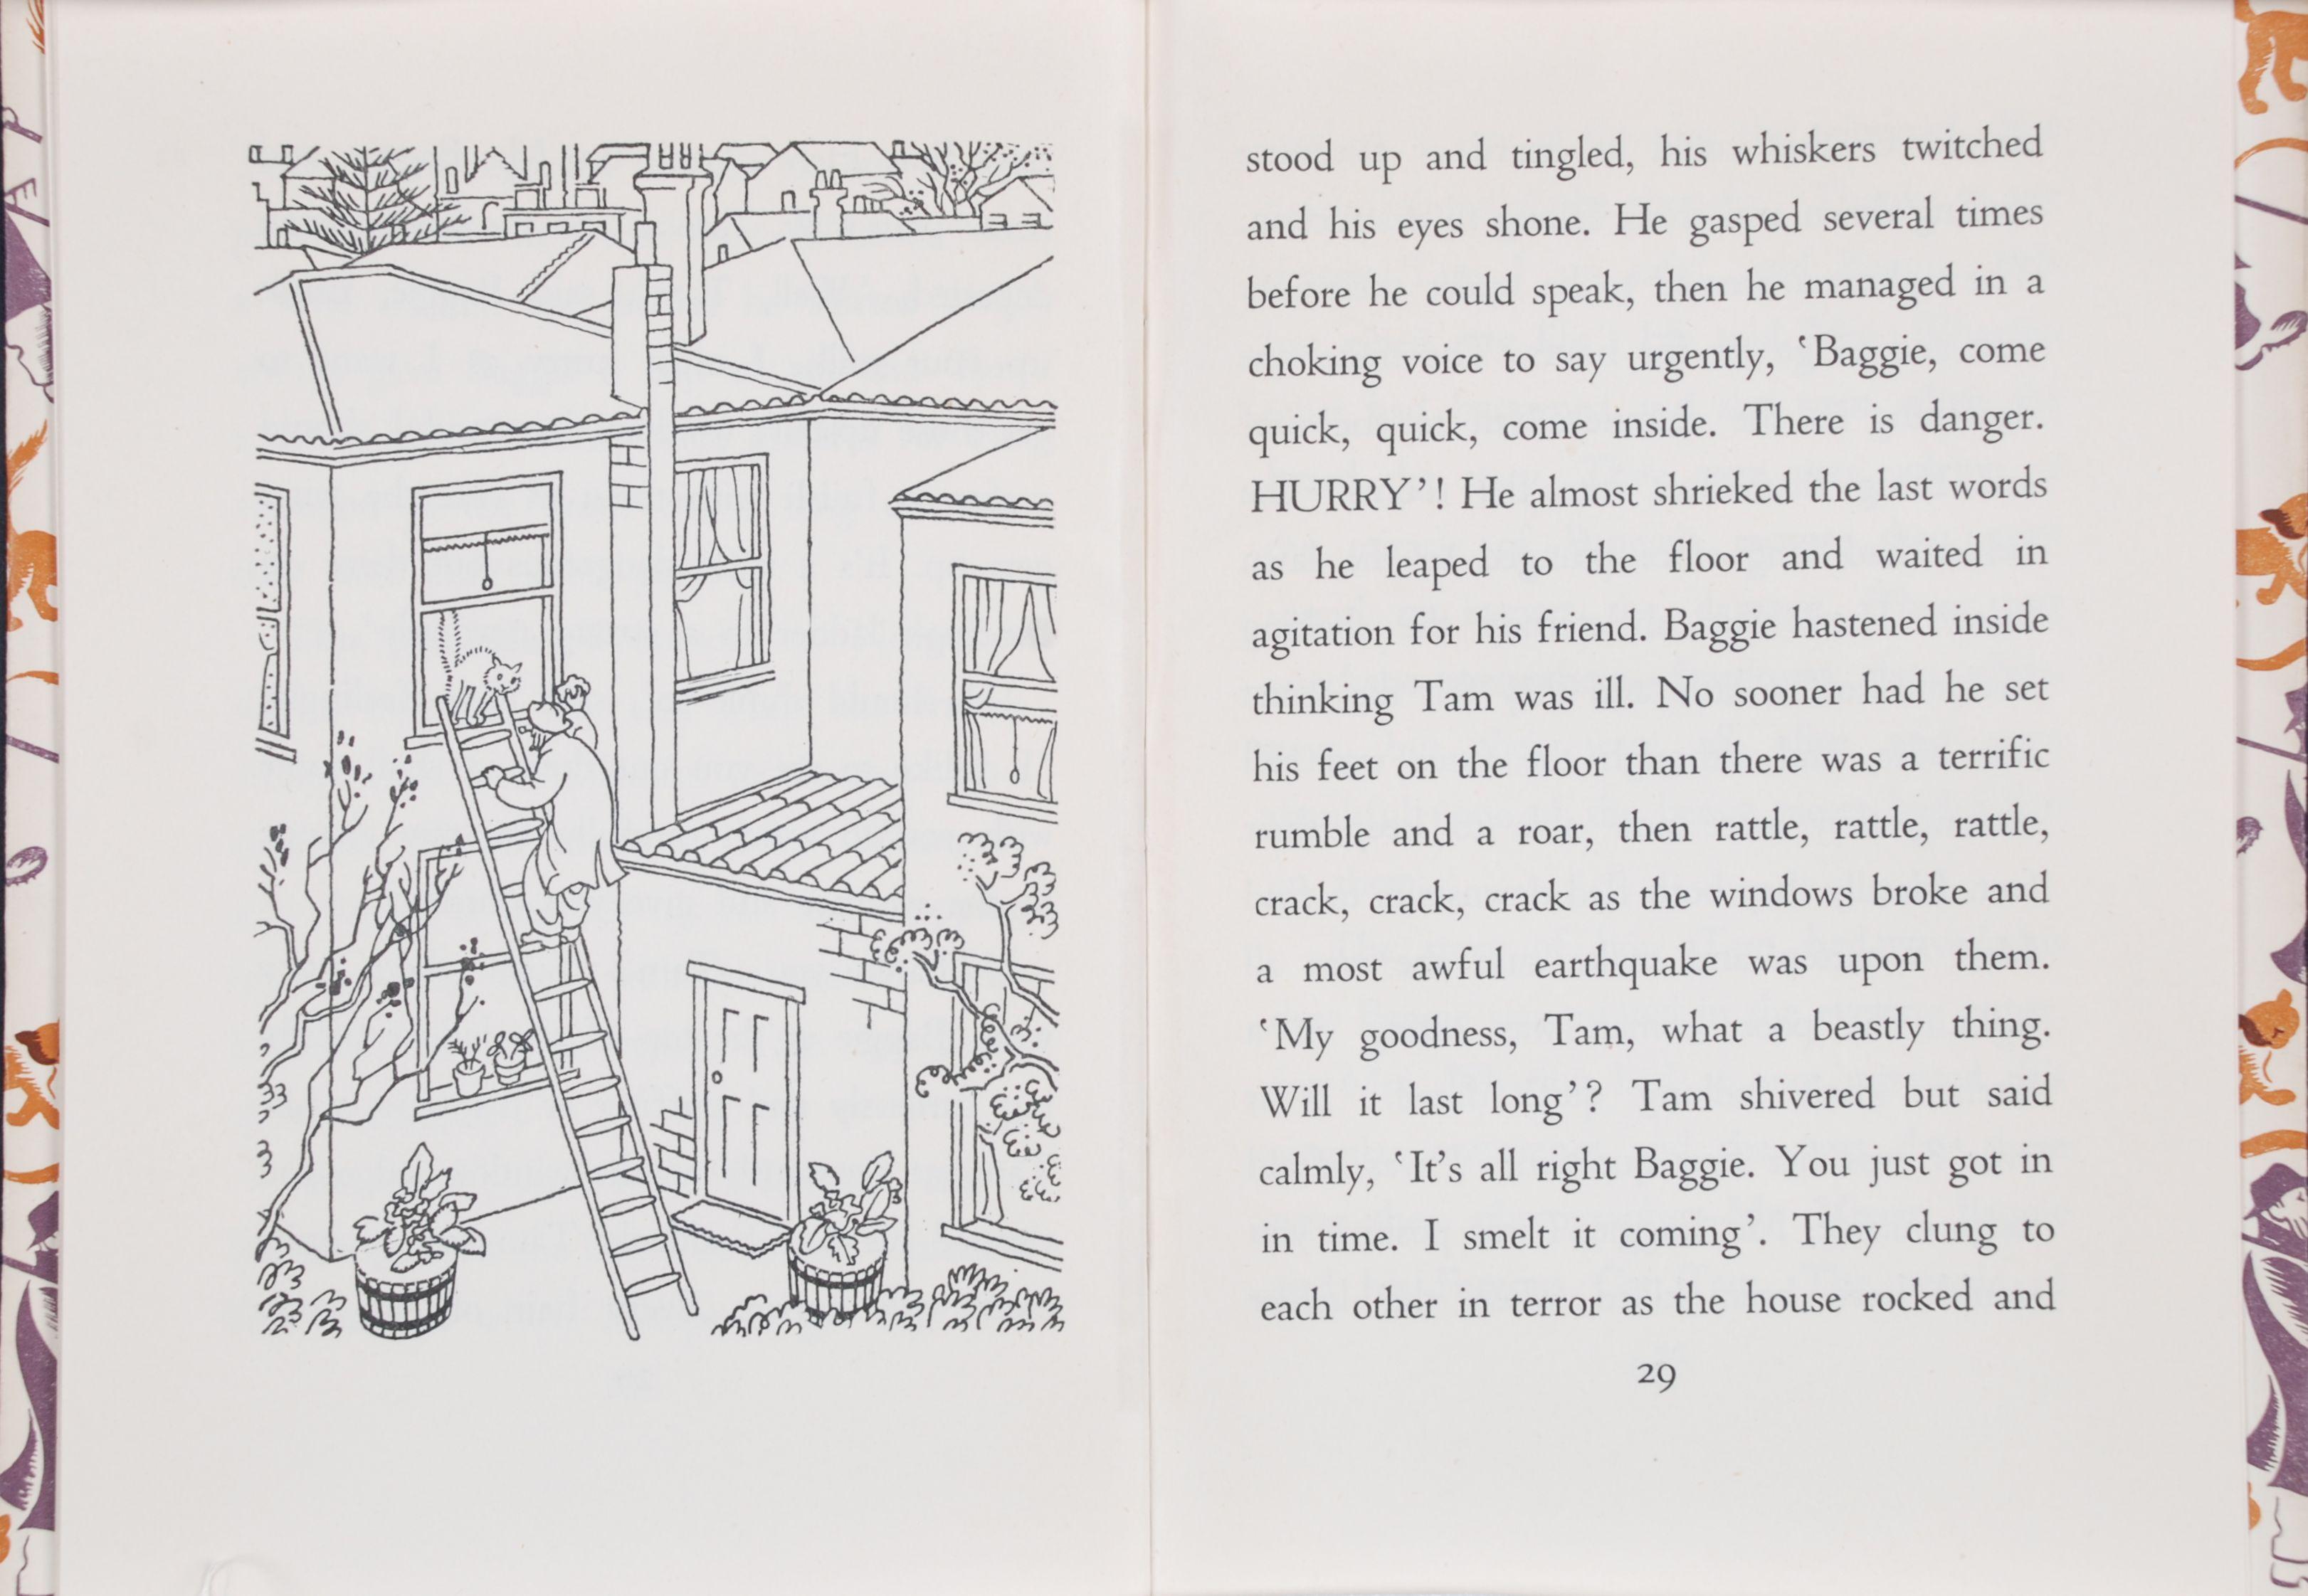 Alexandra Mason. Baggie and his famous cat Tam. Wellington, N.Z.: Progressive Publishing Society, 1944.